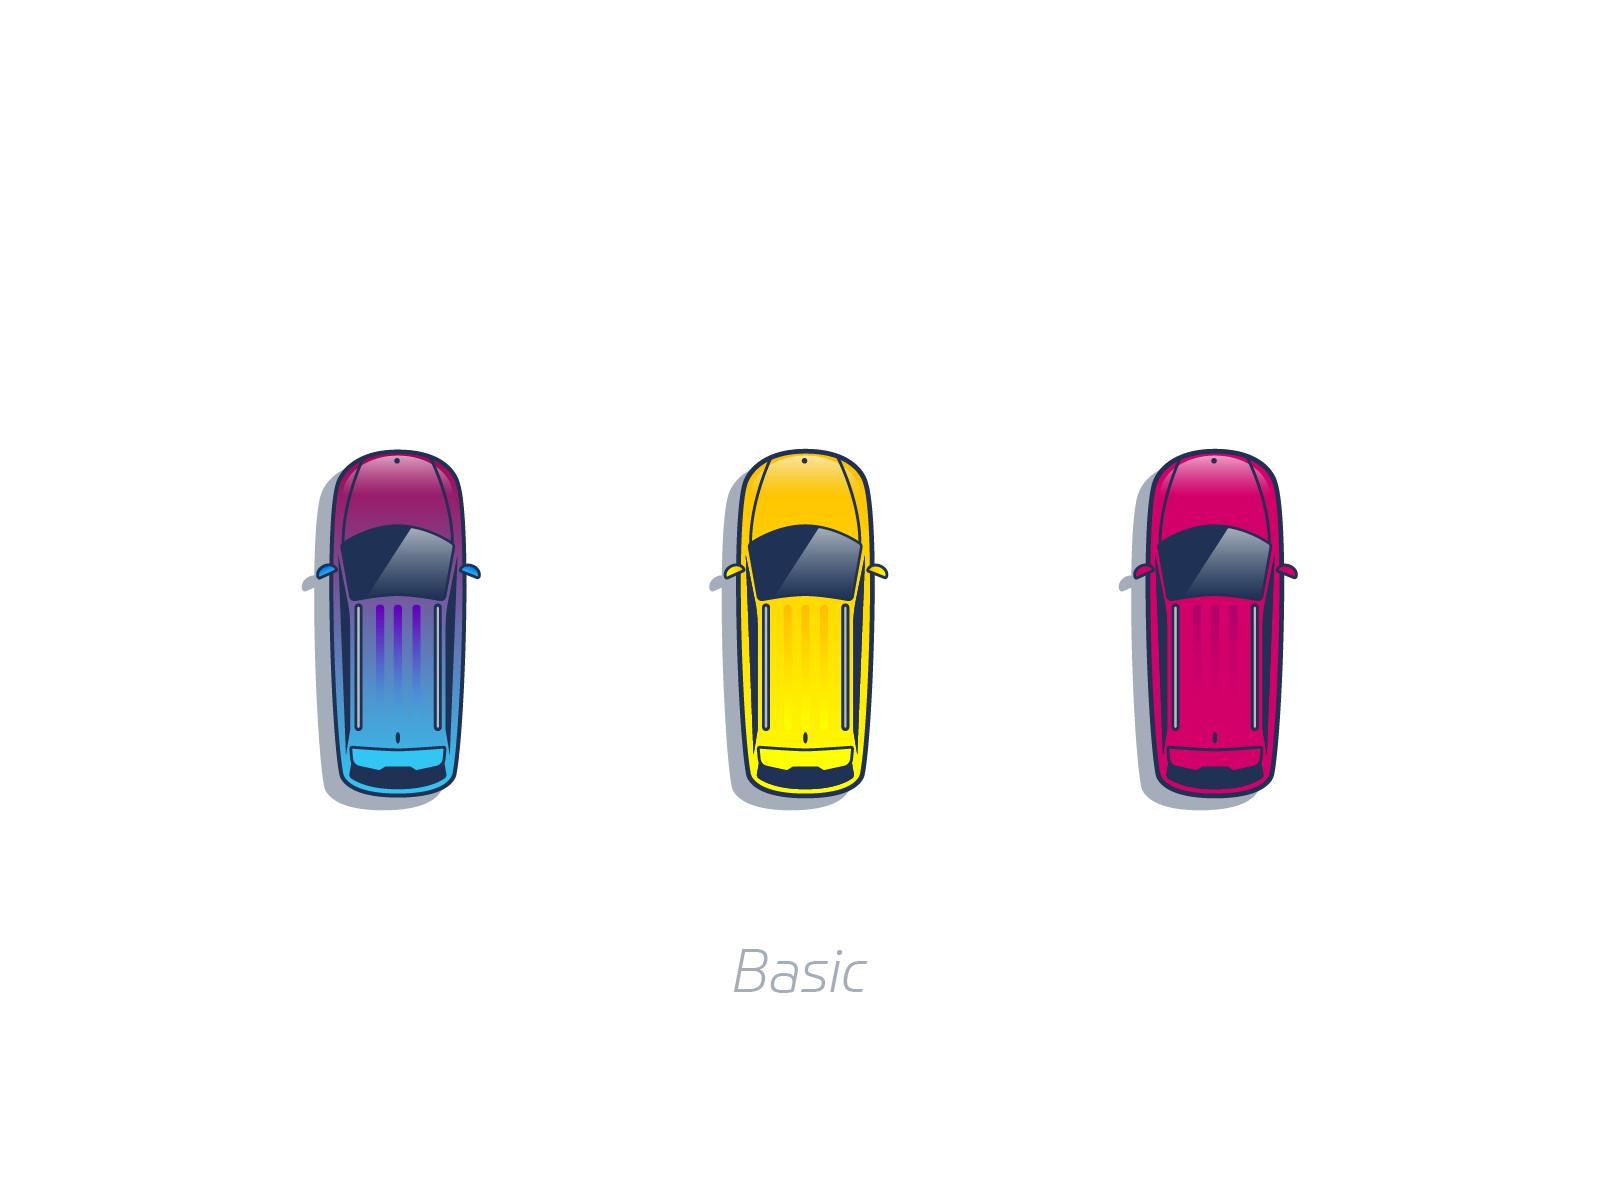 Basic cars game graphic design